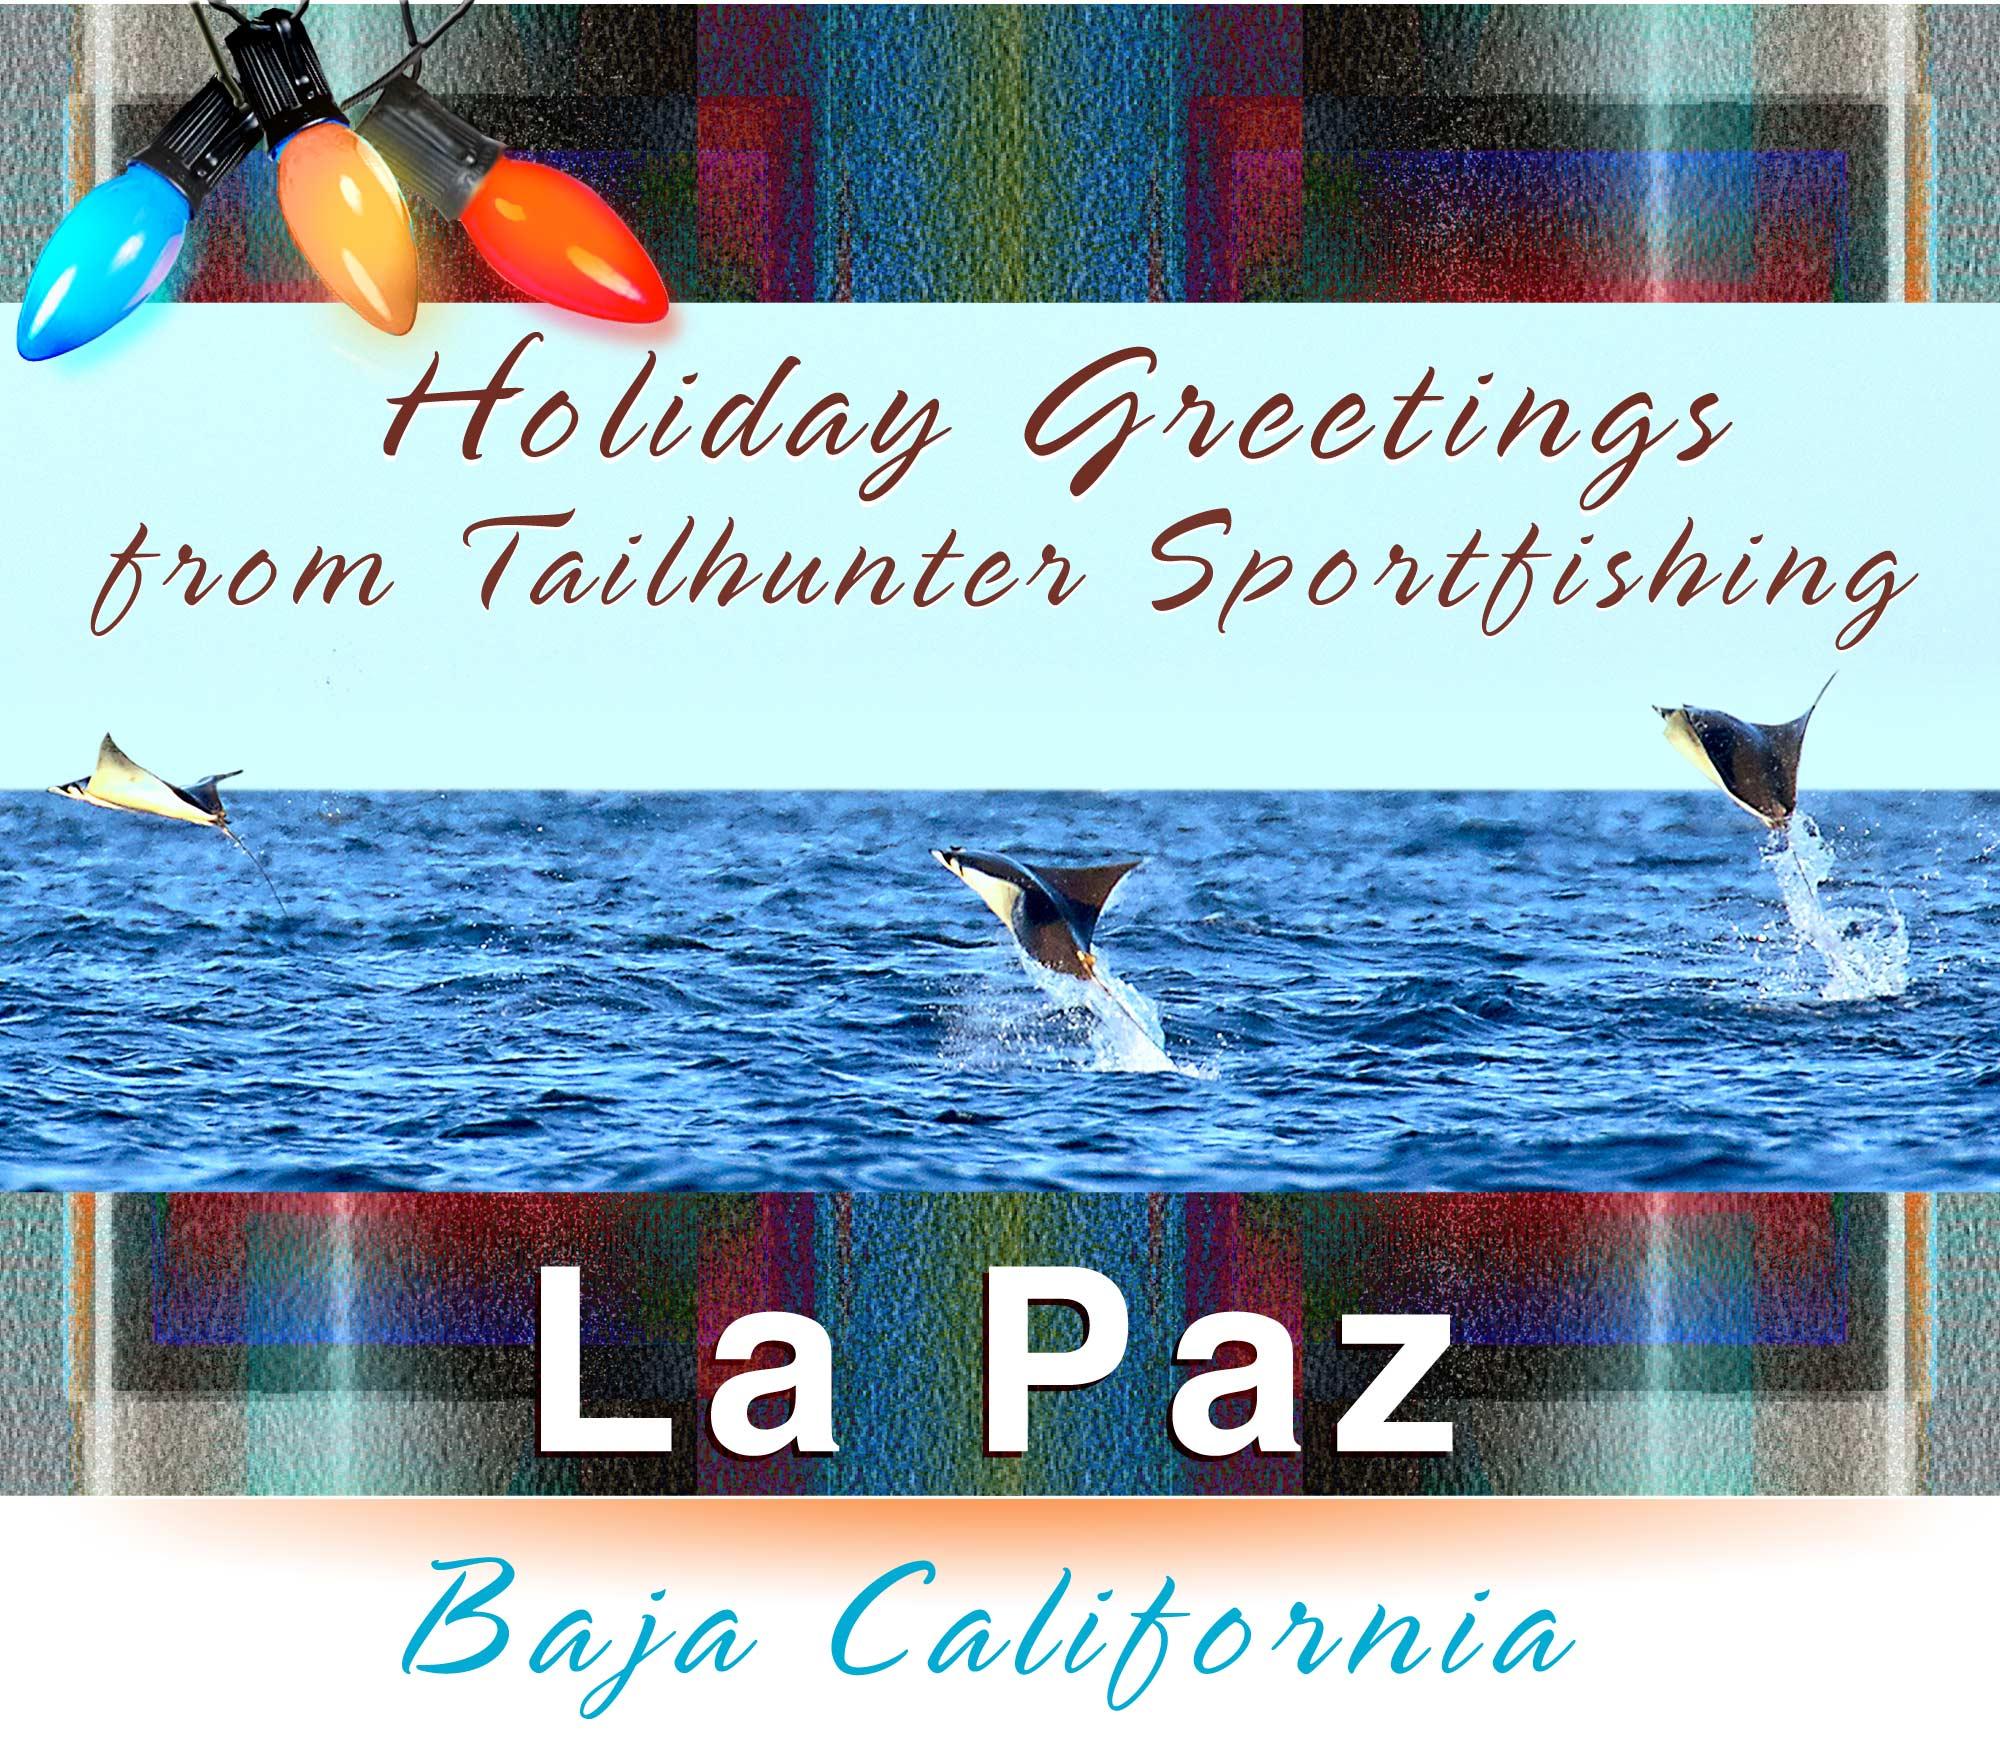 Tailhunter Sportfishing - Holiday in Baja